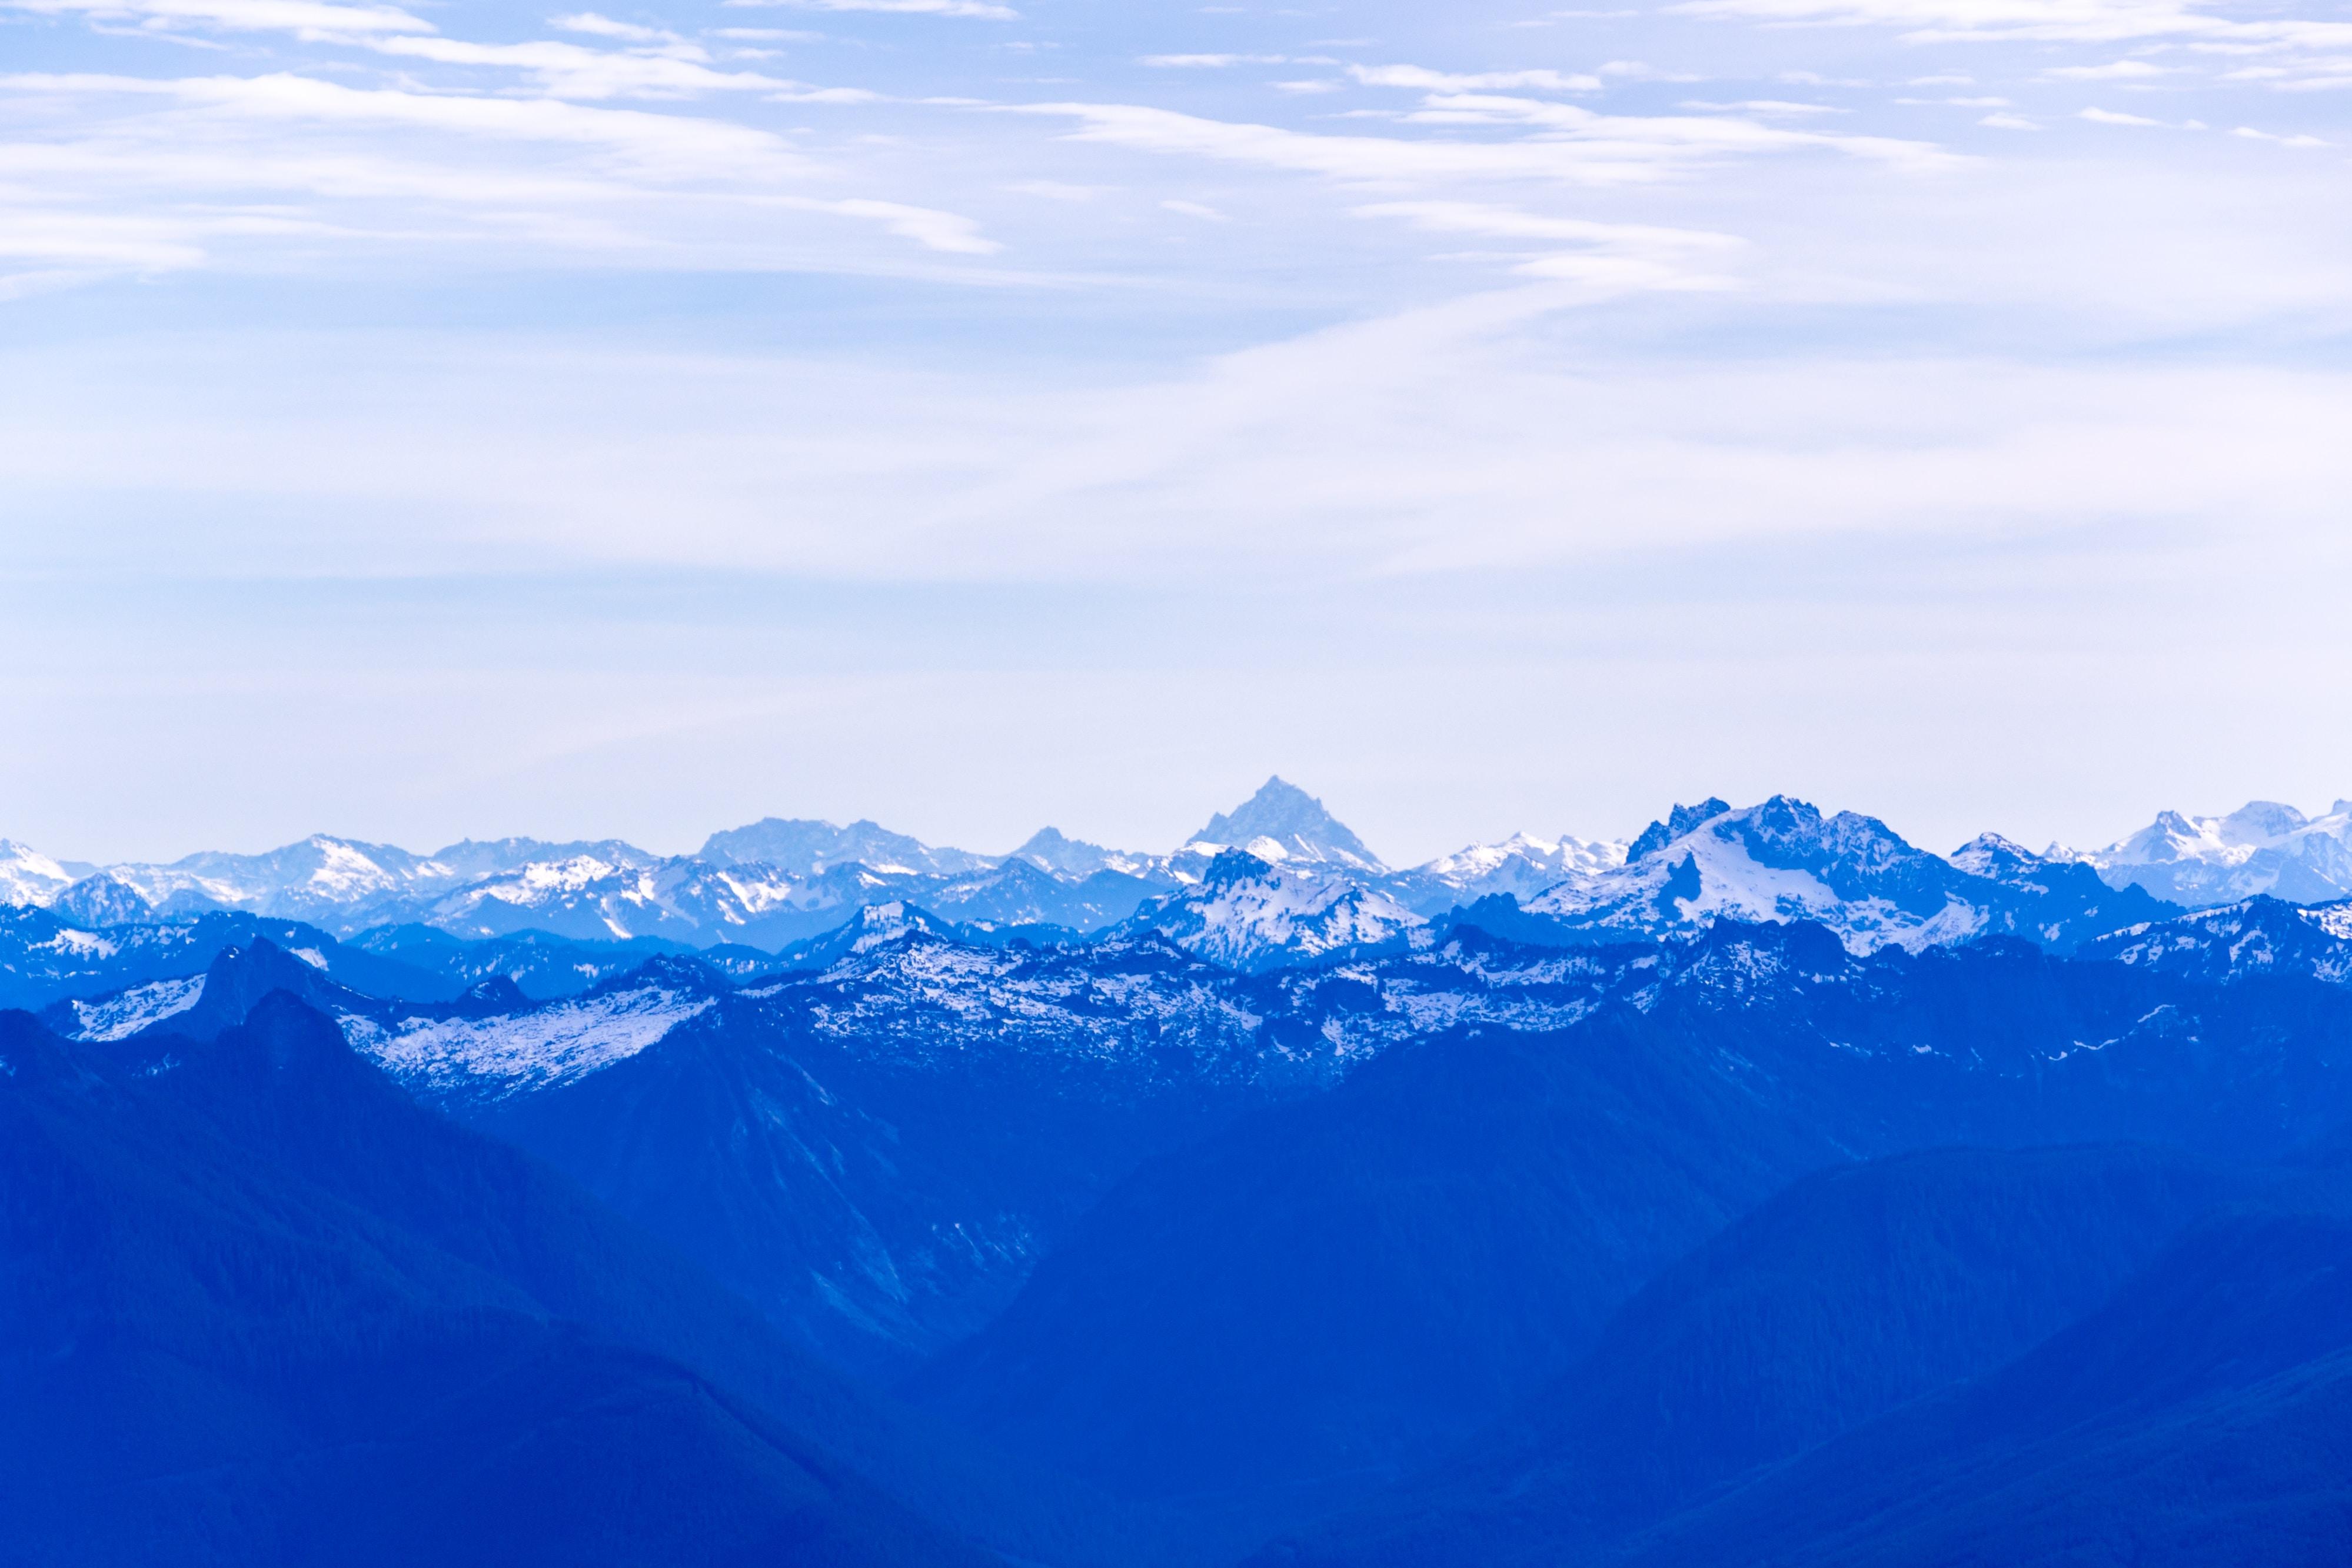 The sharp peak of Mount Pilchuck on the horizon rising up above a hazy mountain range